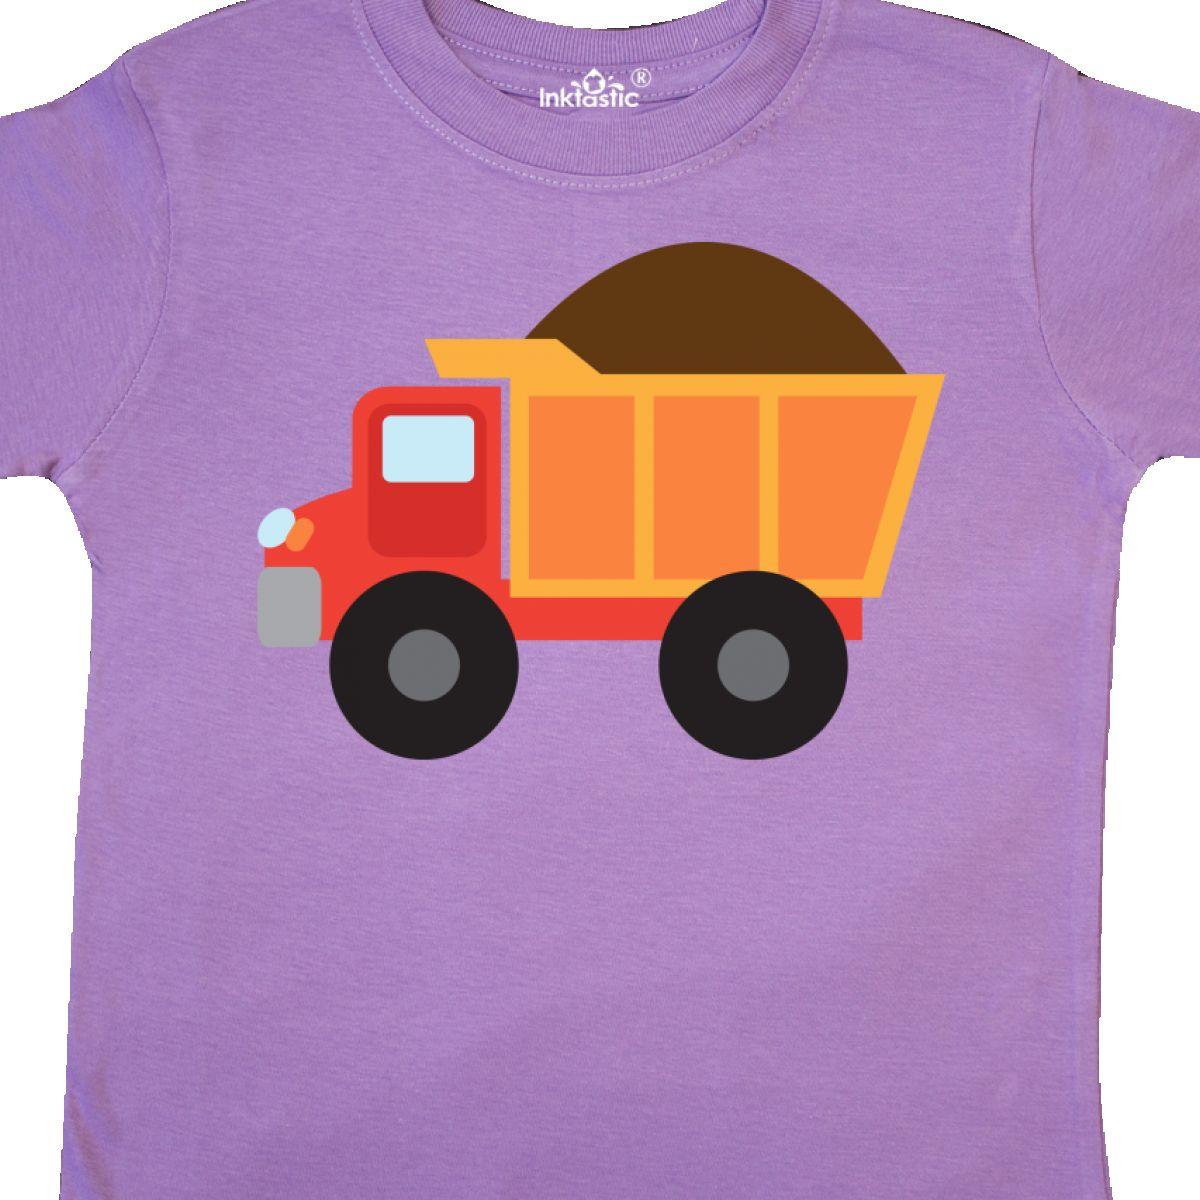 Inktastic-Work-Truck-Construction-Vehicle-Toddler-T-Shirt-Trucks-Vehicles-Cute thumbnail 18